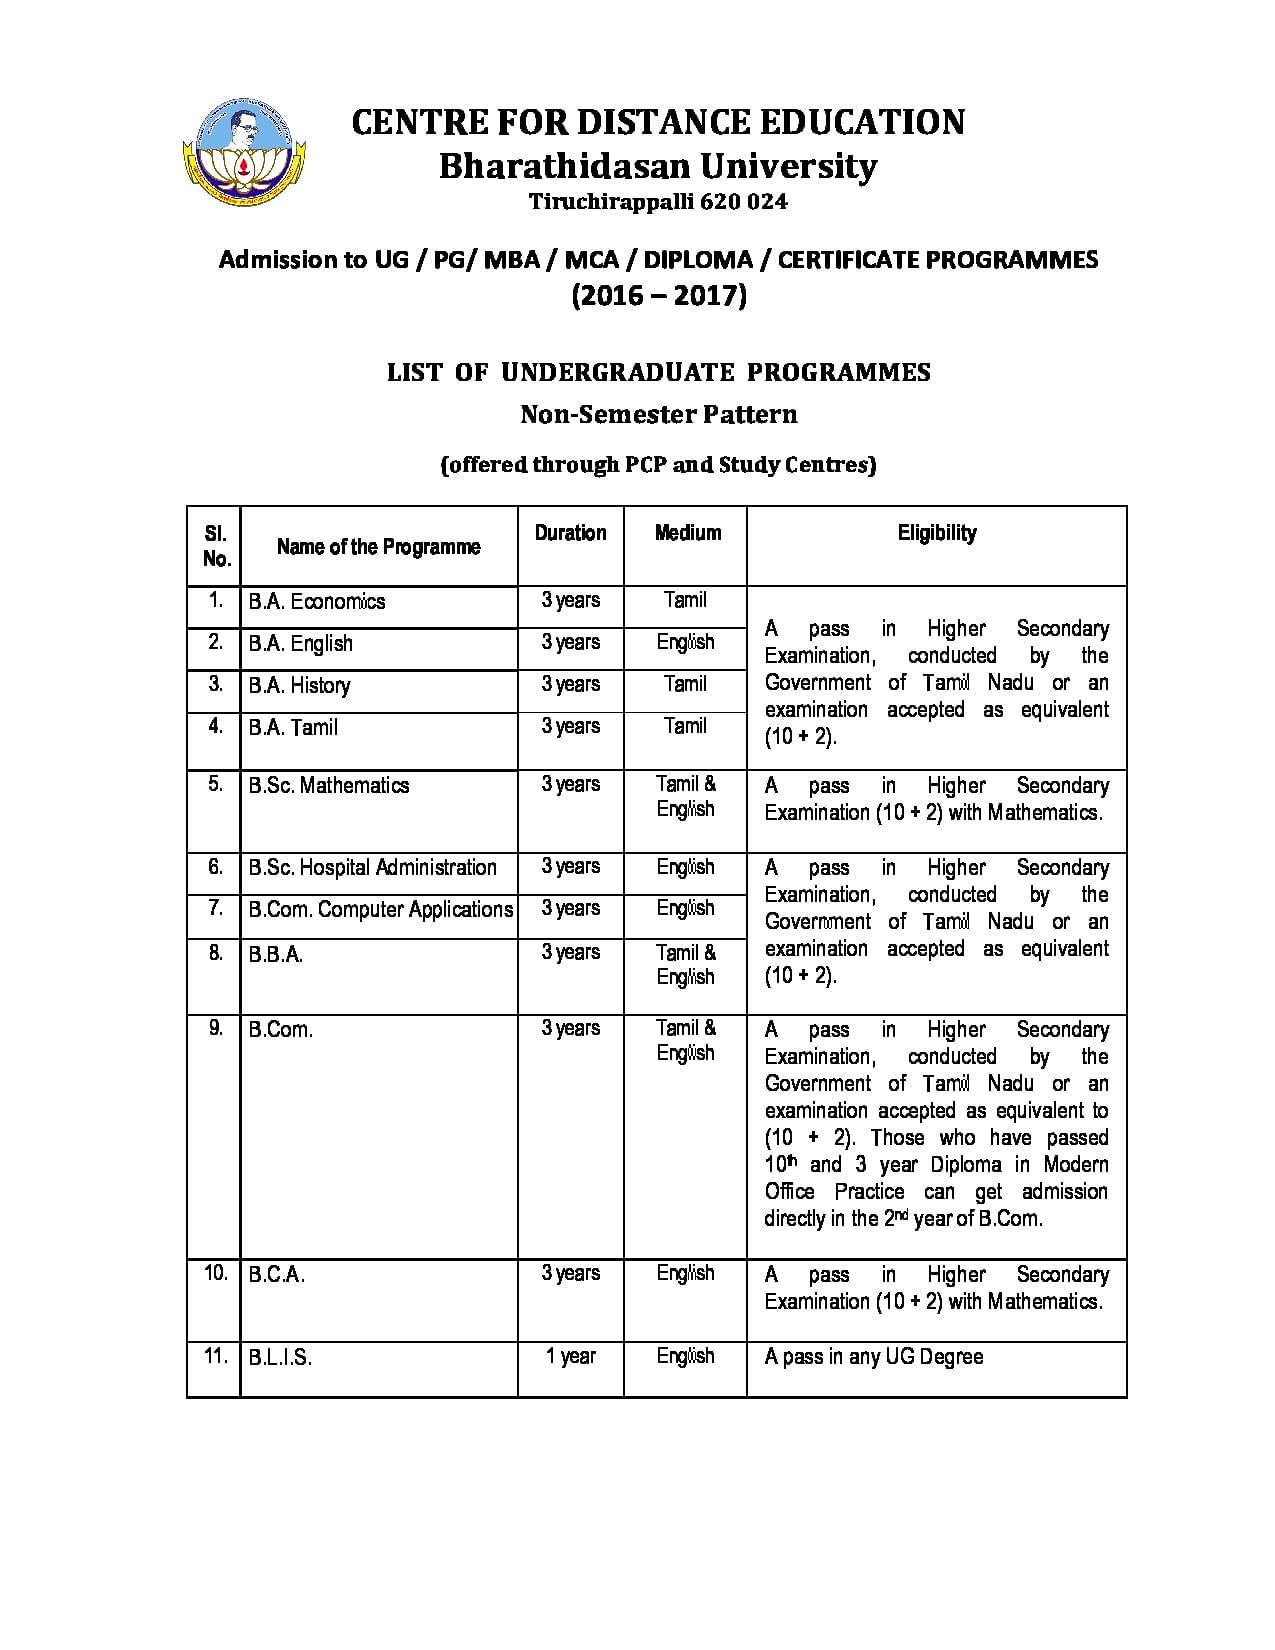 Bharathidasan University Centre For Distance Education Cde